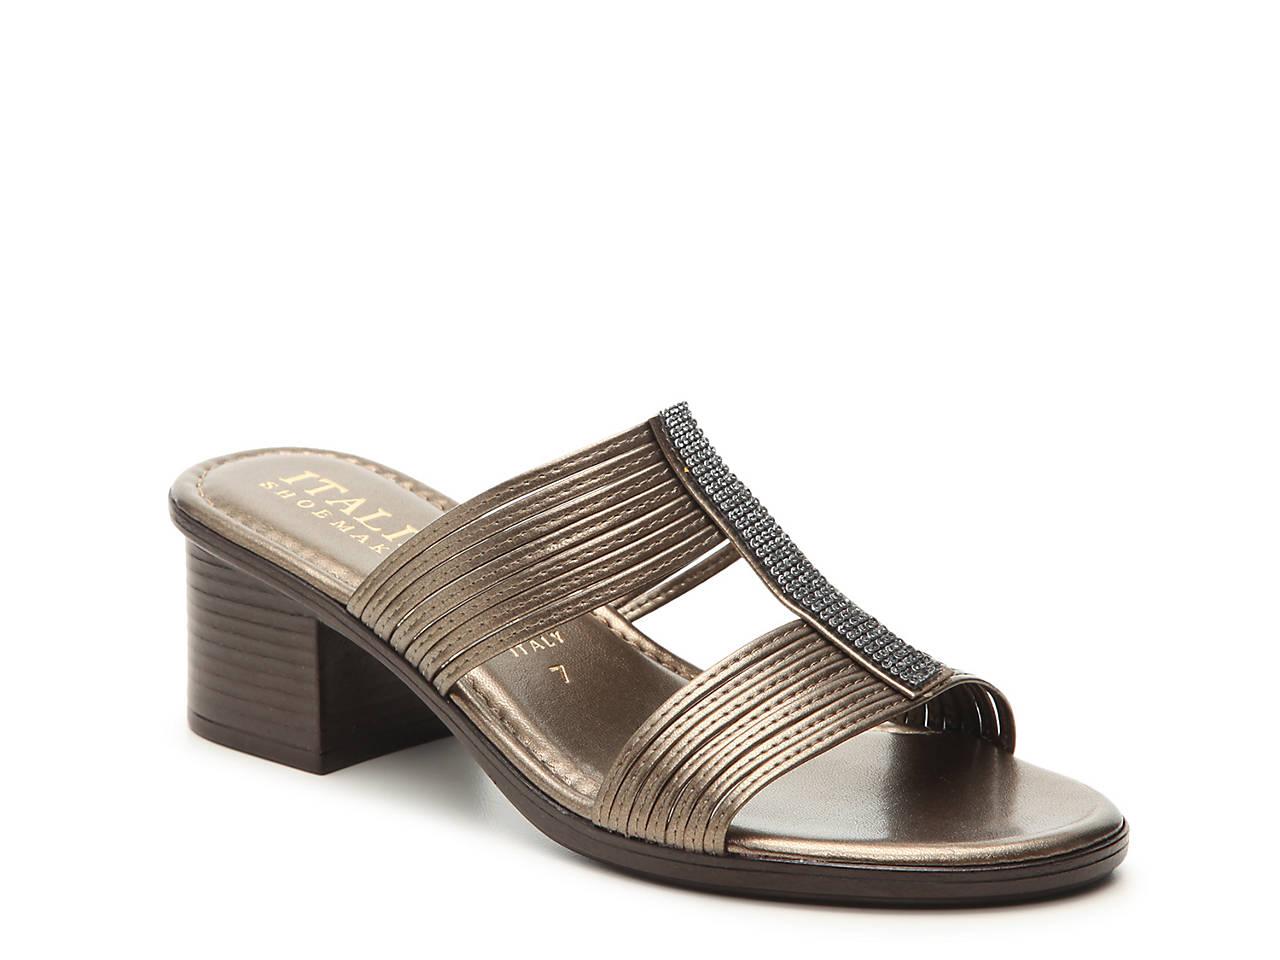 cc4d4bcc3 Italian Shoemakers Rhinestone Sandal Women s Shoes